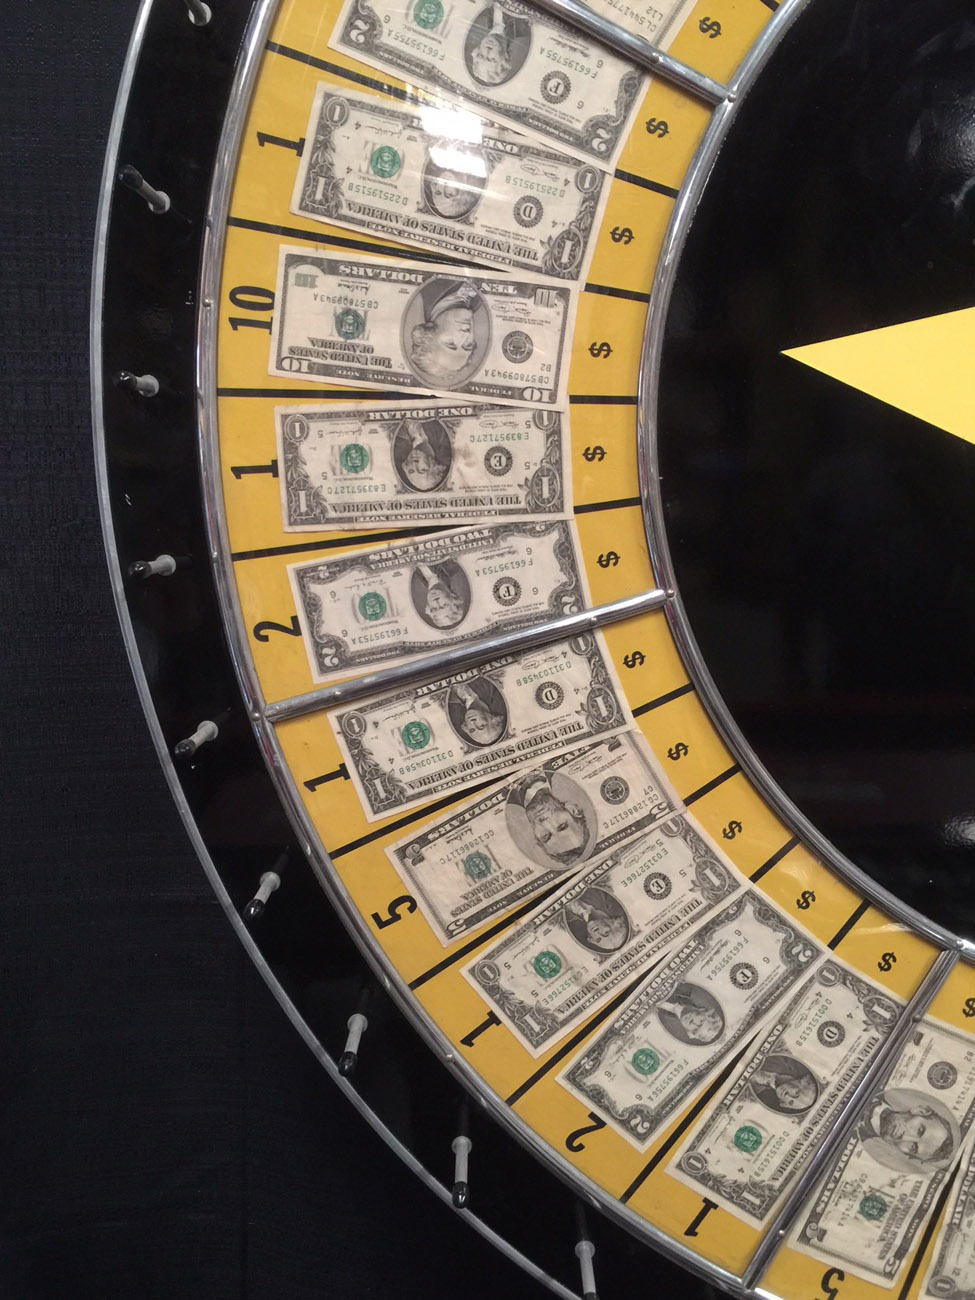 Amazing 777 casino